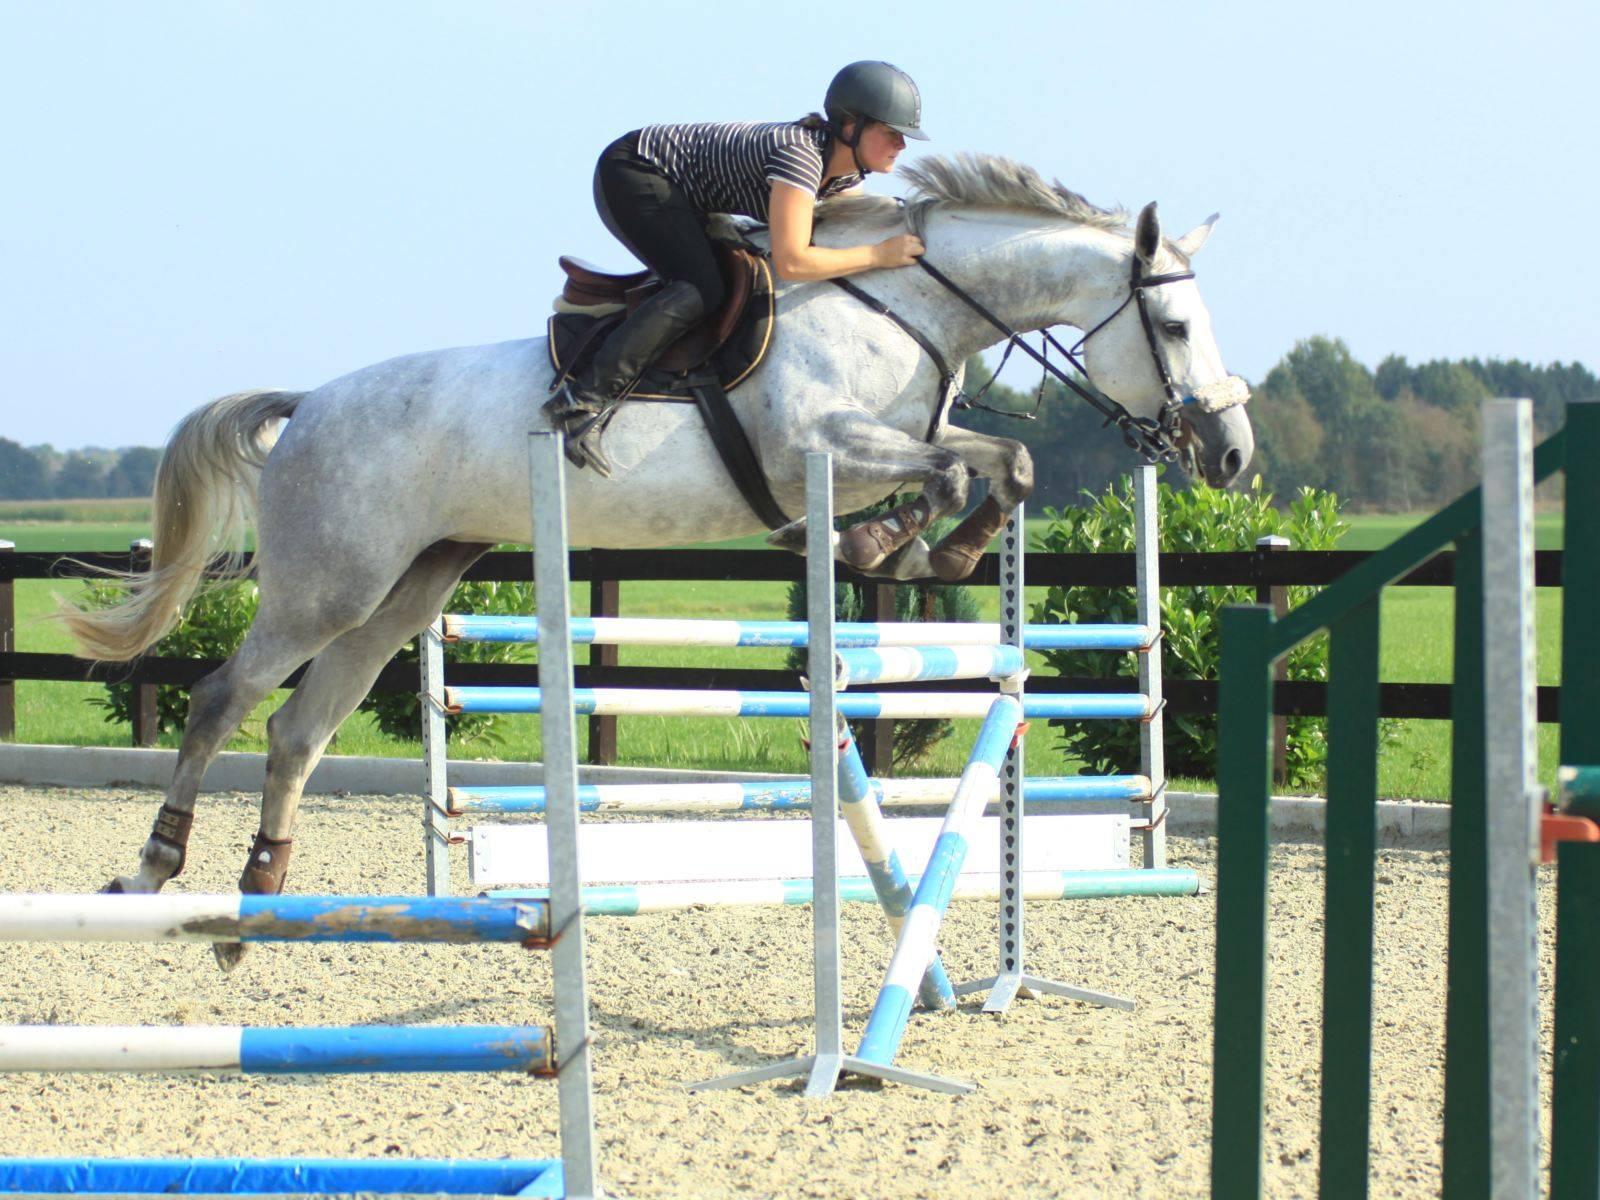 Jumping Horses for Sale Dubai